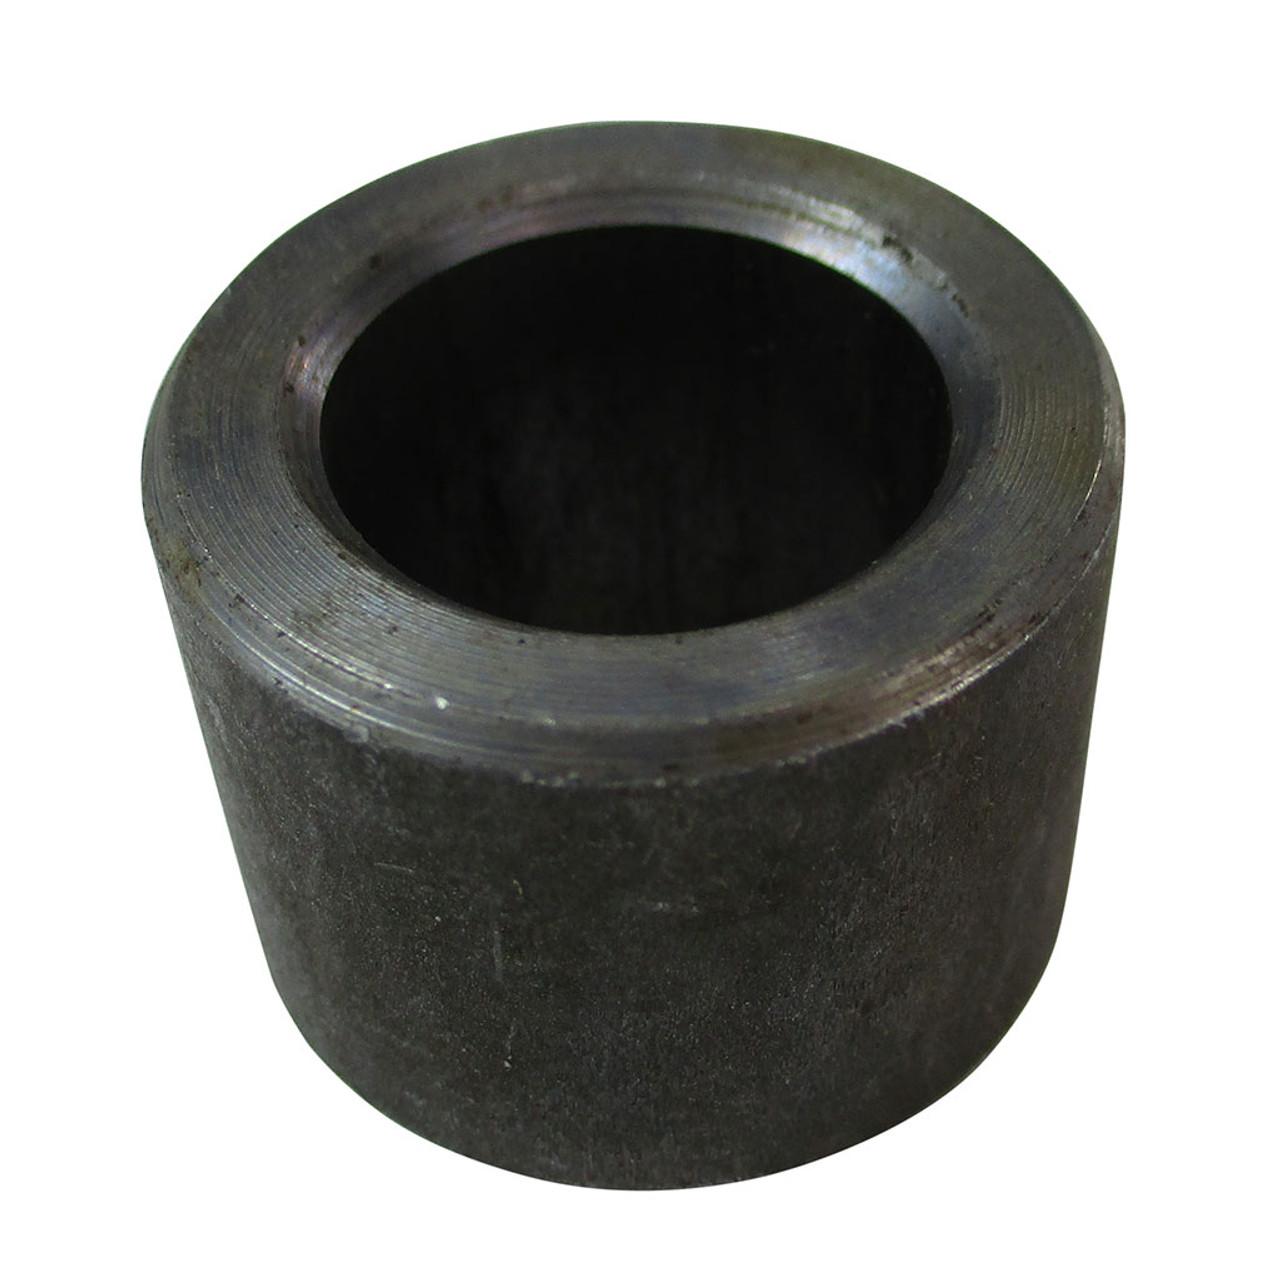 "Steel Axle Bushing - 5/8"" x 3/4"""